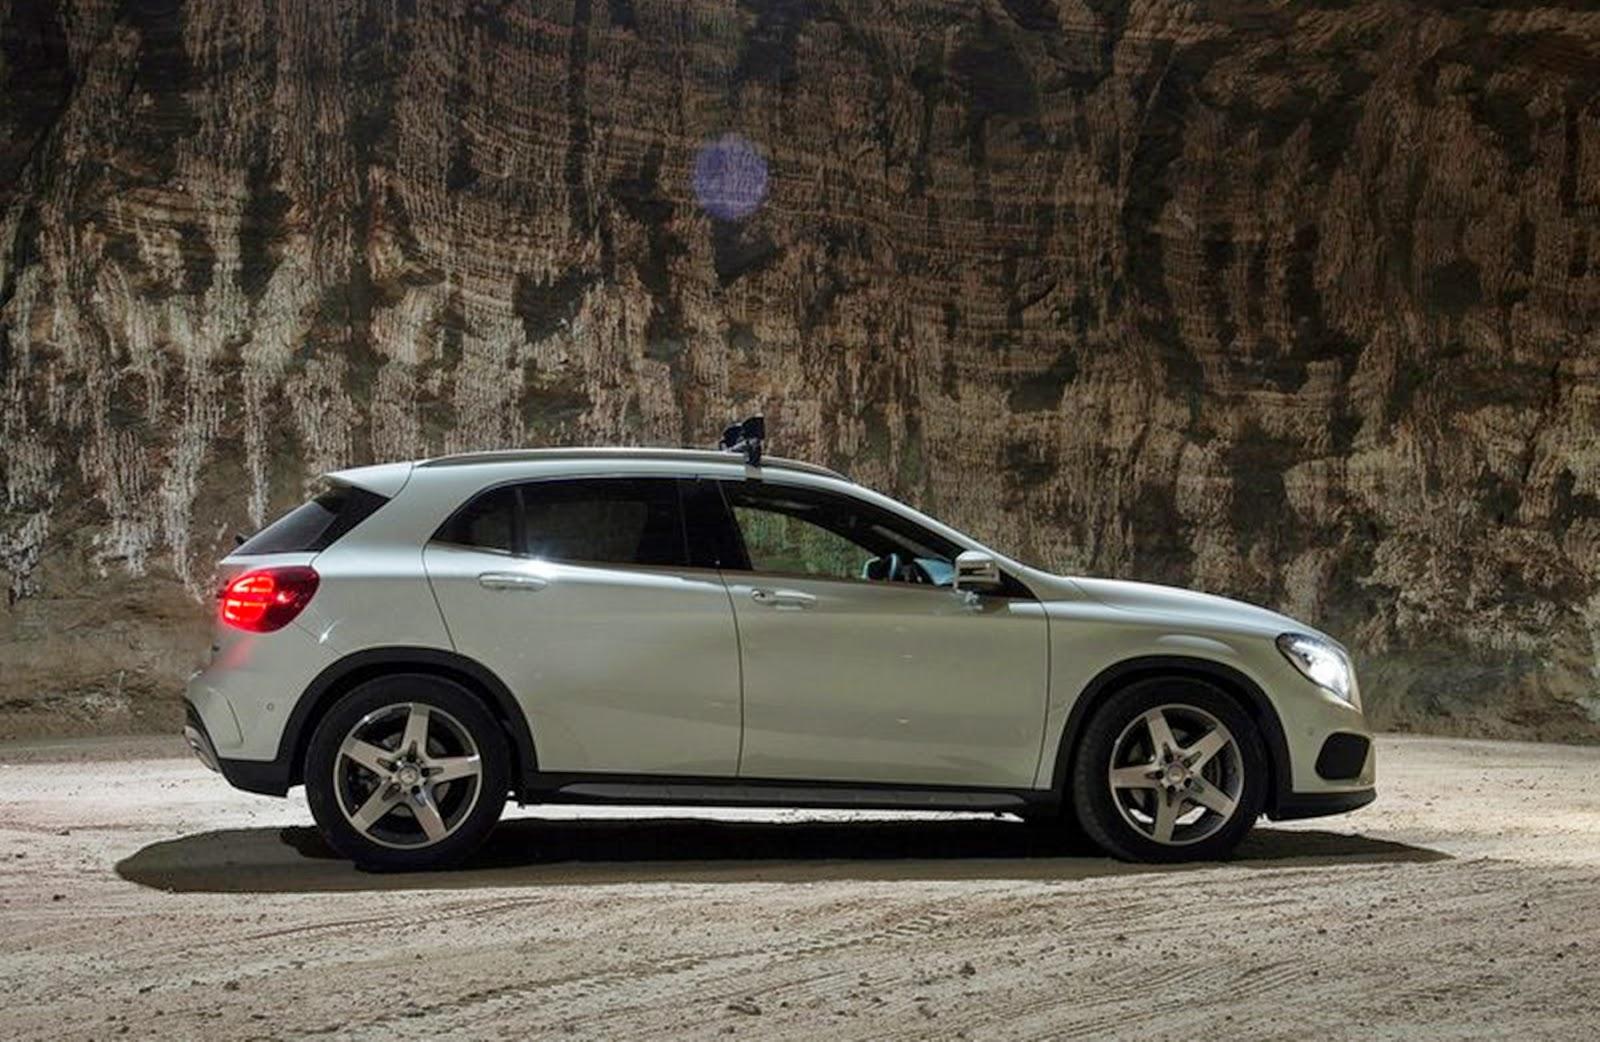 http://4.bp.blogspot.com/-6mfJHs_Wfk4/U4q7FM4k3kI/AAAAAAAAK-0/LMjagj2KCnA/s1600/Carro-Mercedes-Benz-GLA_UK-Version_2015_wallpaper_car-+1800x1172.jpg